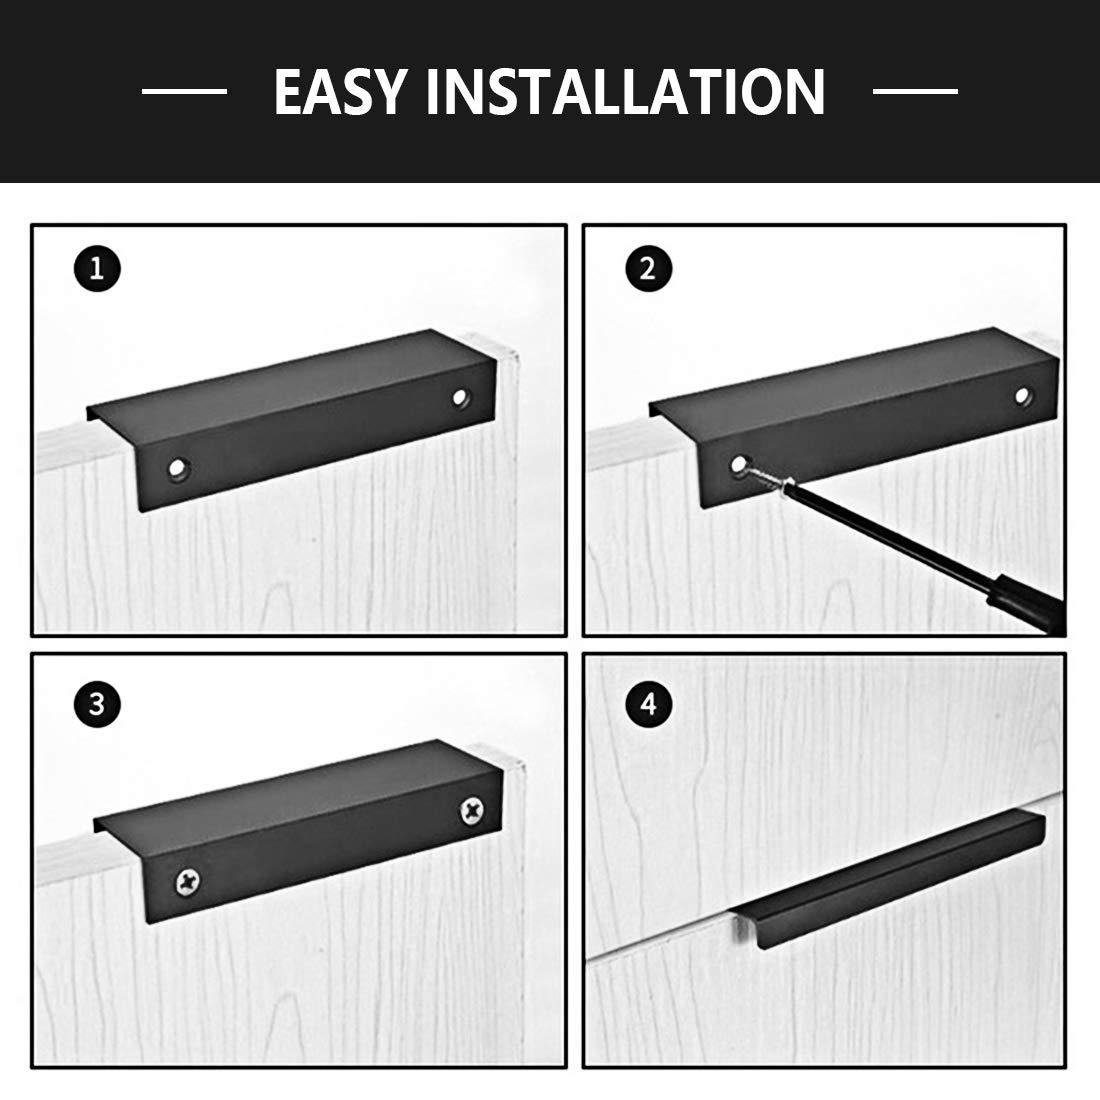 2Pcs LICTOP 80mm//3.15 Black Modern Style Finger Edge Tab Pull Handle Door Knobs Drawer Pulls Aluminum Matte